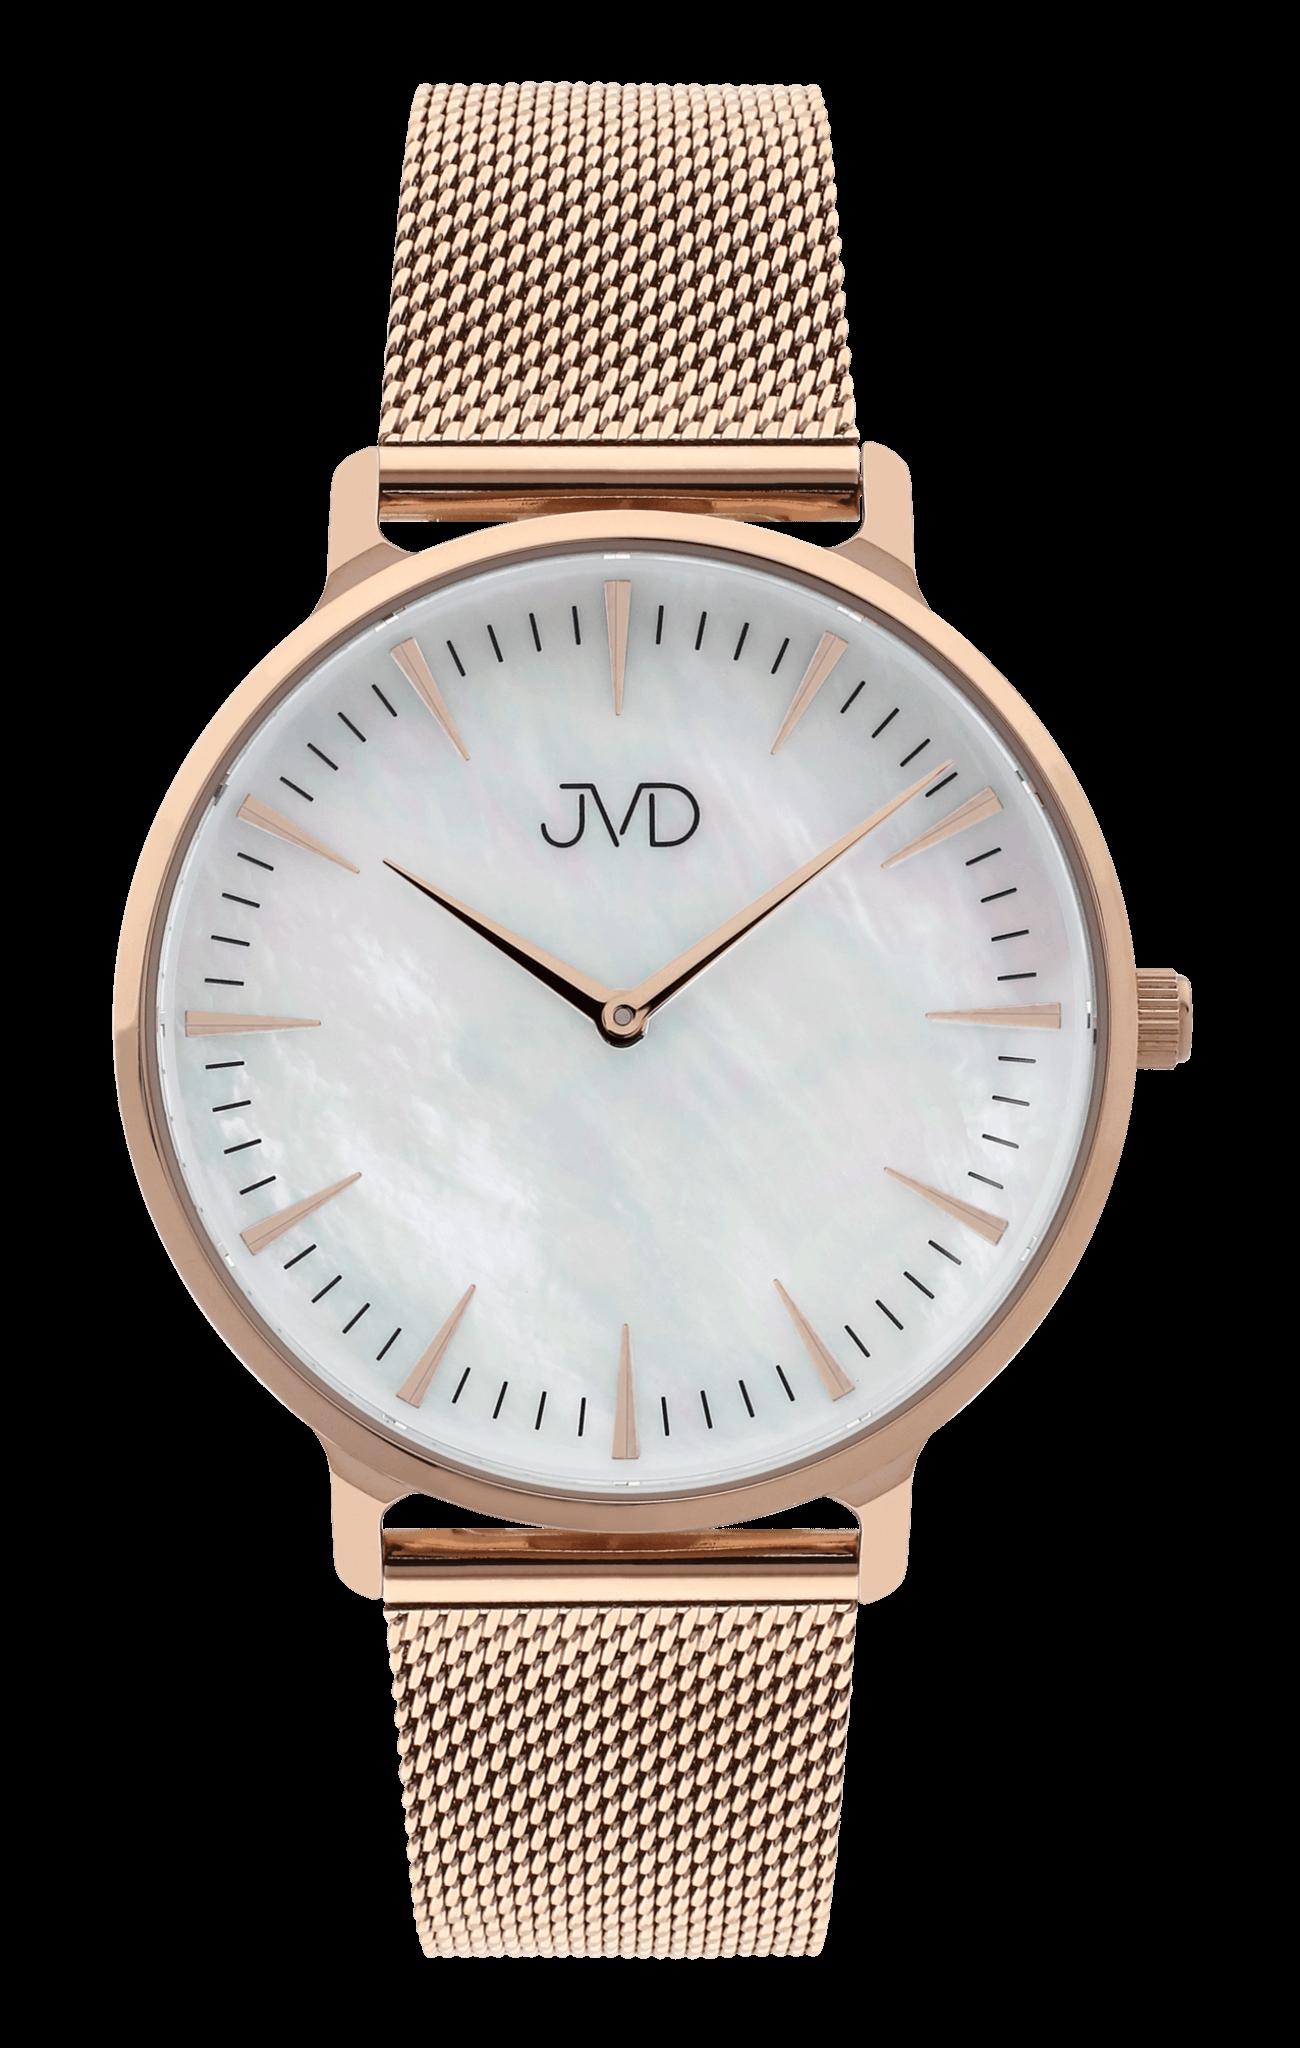 Náramkové hodinky JVD J-TS12 - cs  610099eab9f